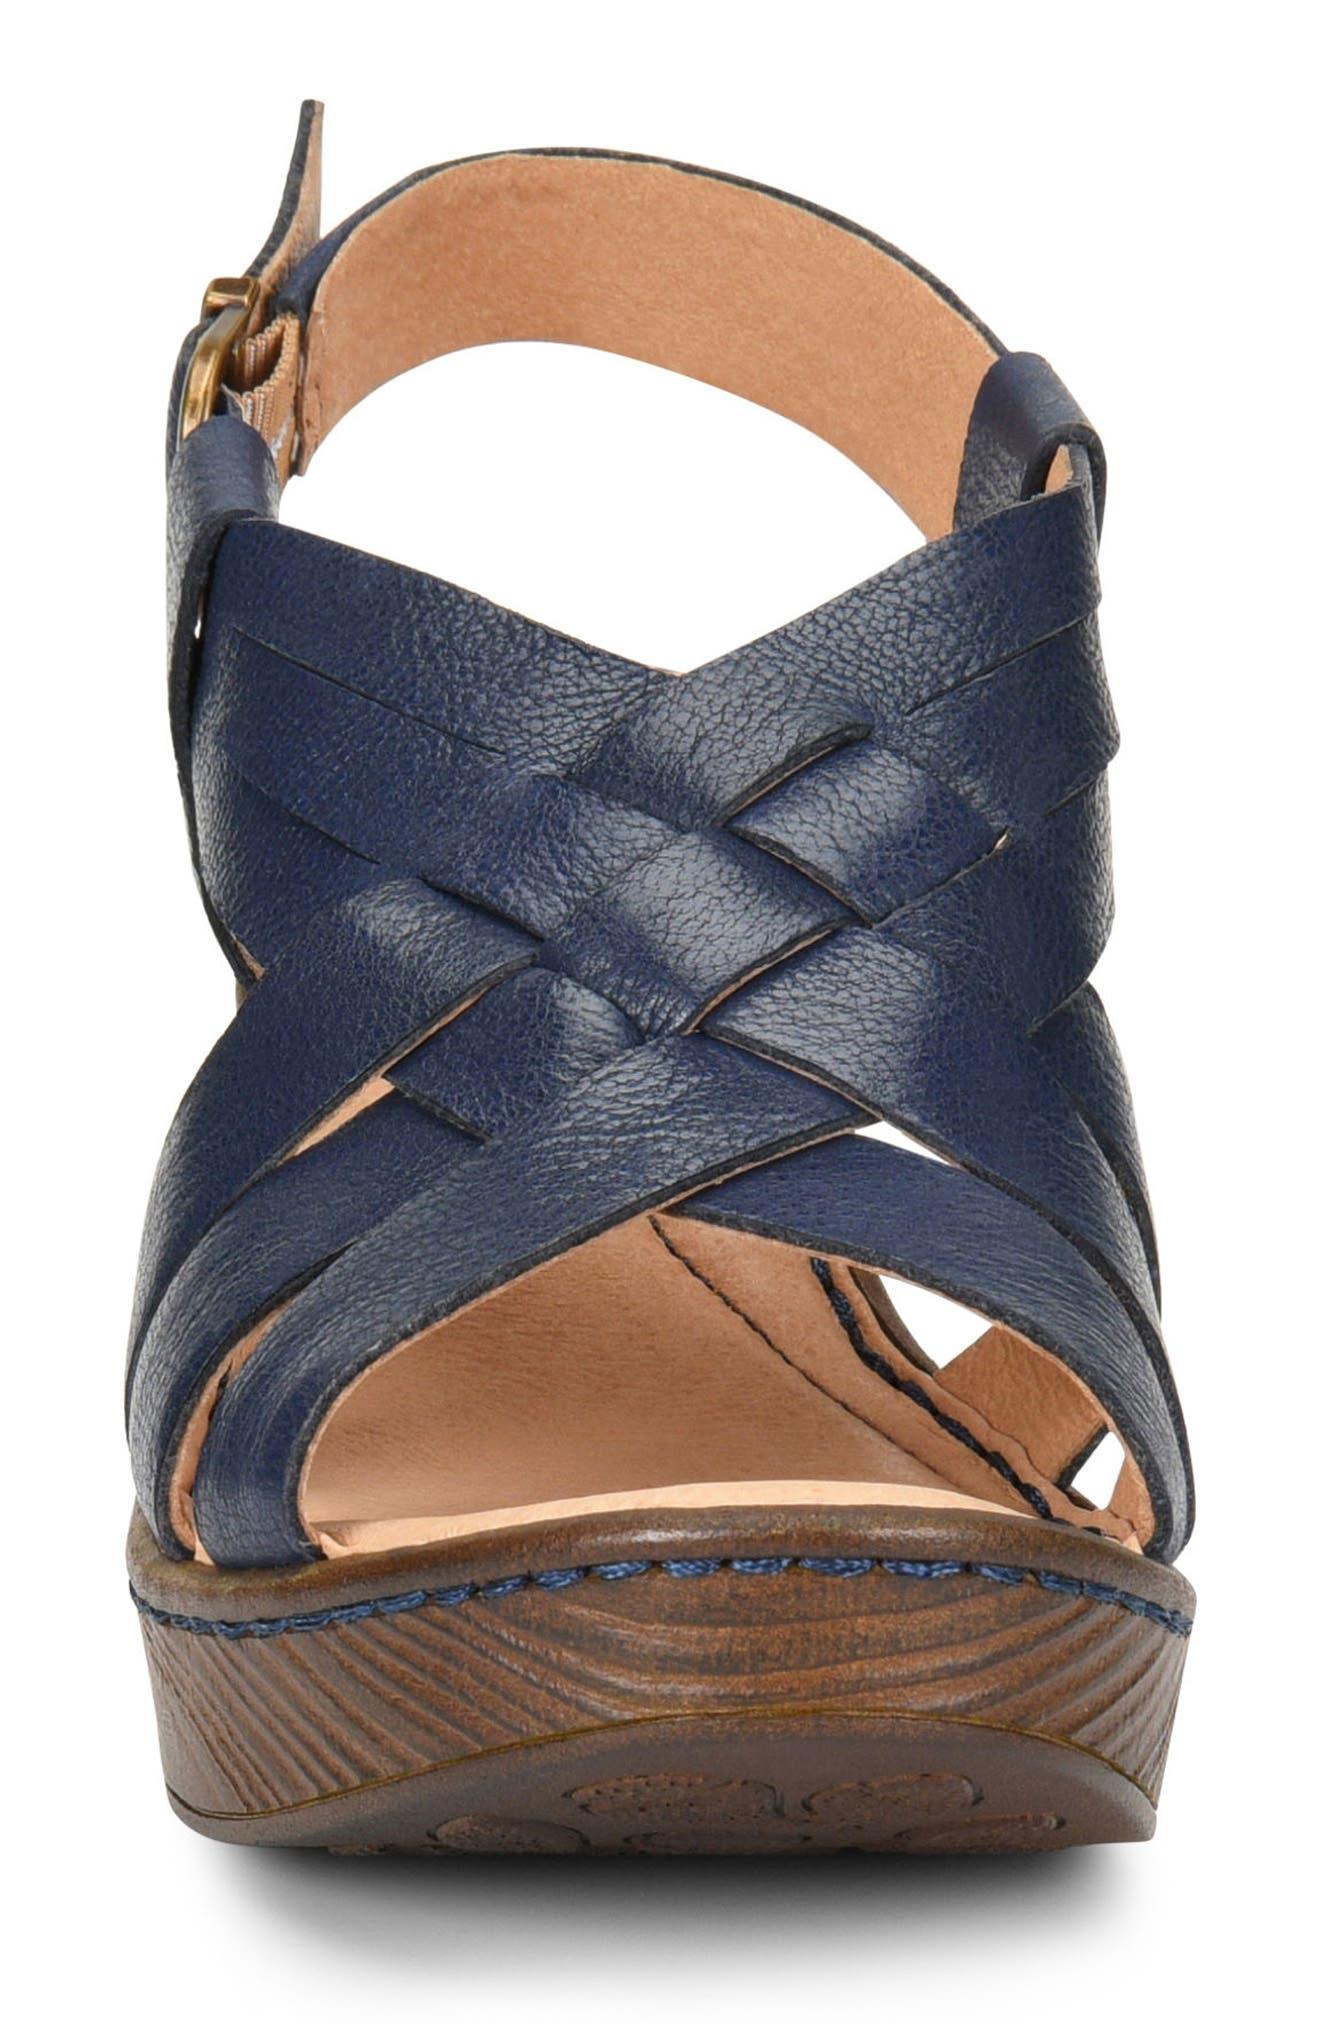 Crevalle Platform Sandal,                             Alternate thumbnail 4, color,                             Navy Leather